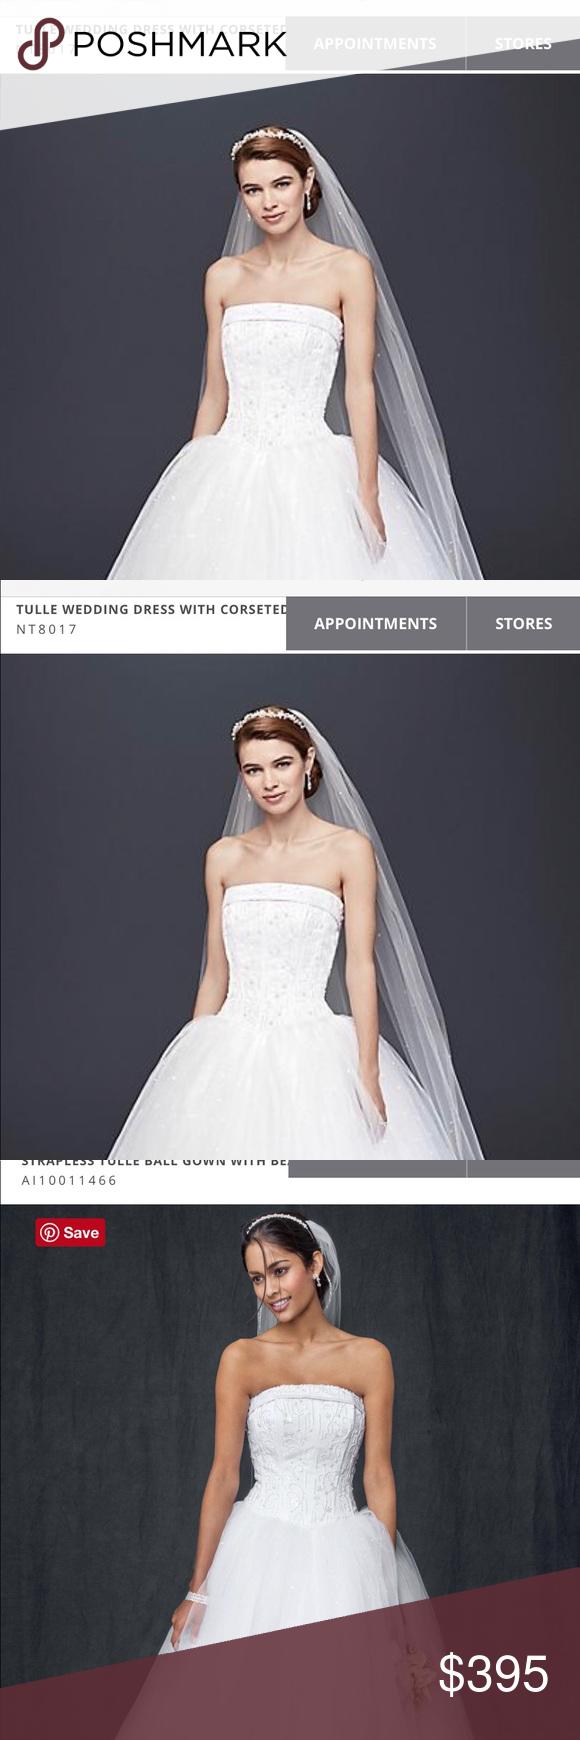 Lace t shirt wedding dress november 2018 Wedding Dress in   My Posh Picks  Pinterest  Tulle balls